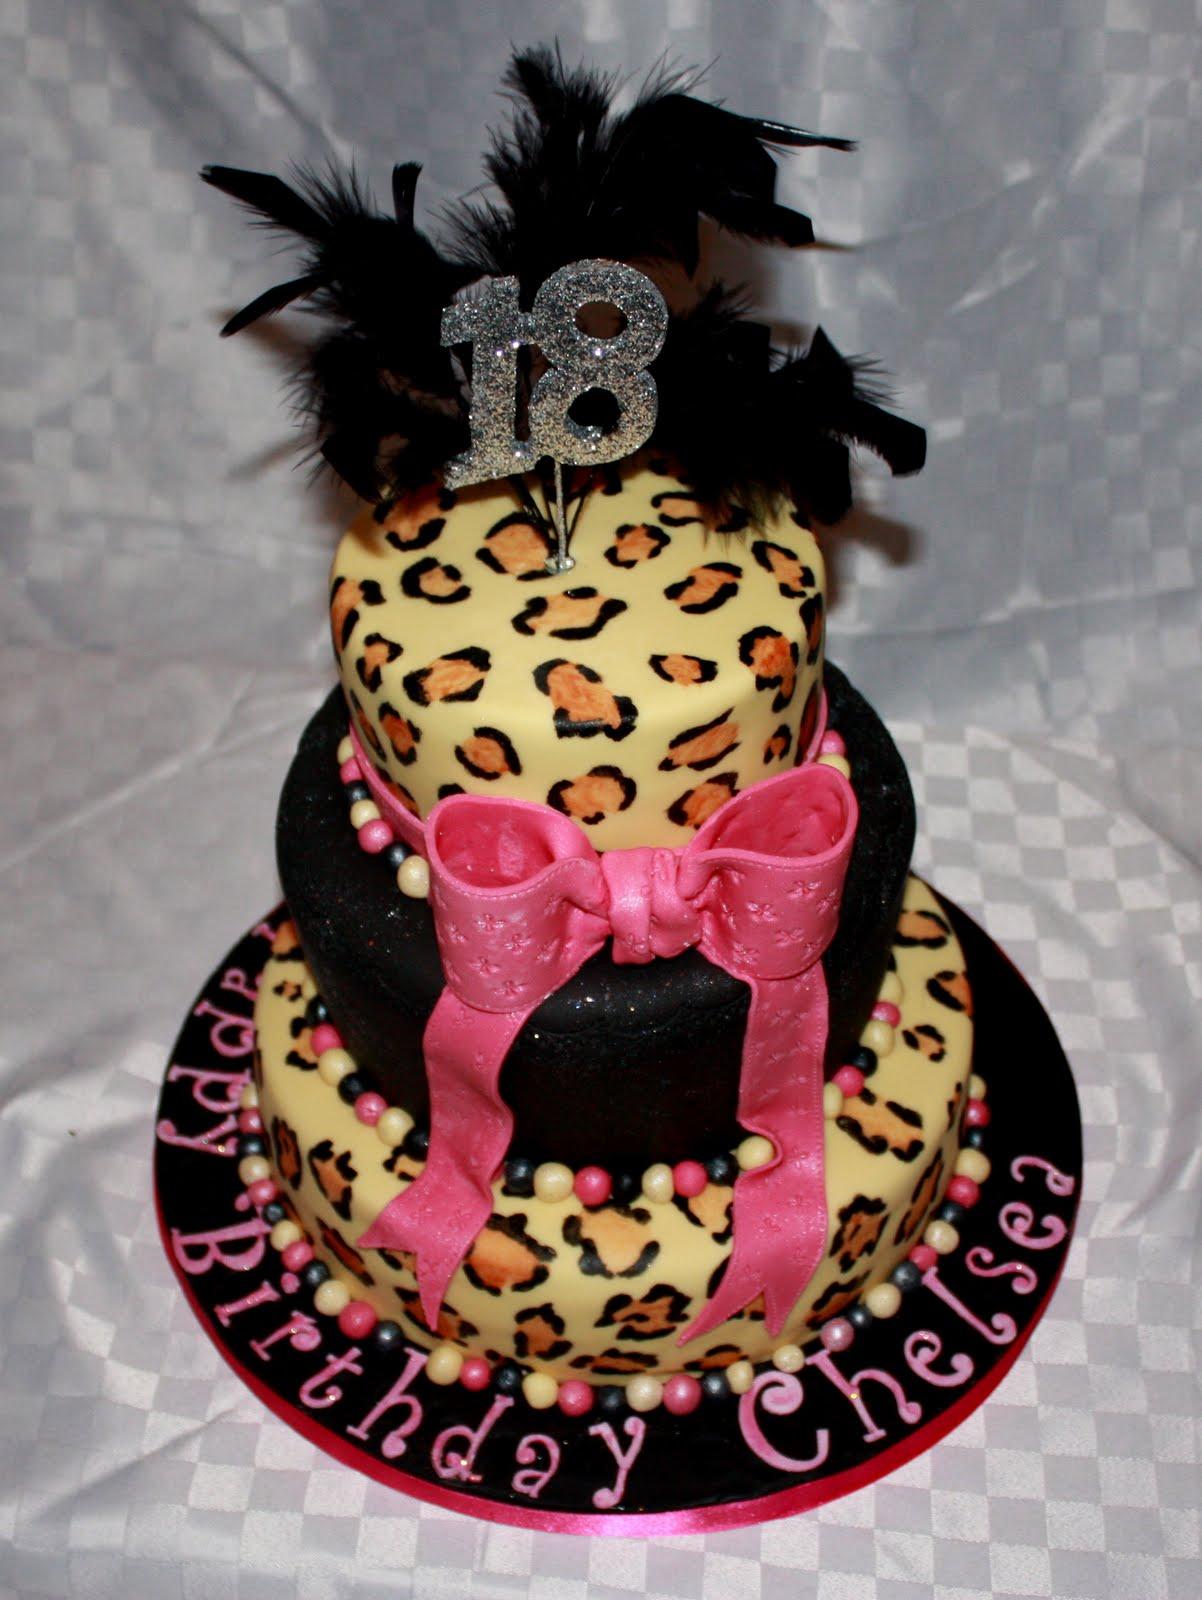 Xtra Special Cakes 18th Birthday Leopard Skin Cake